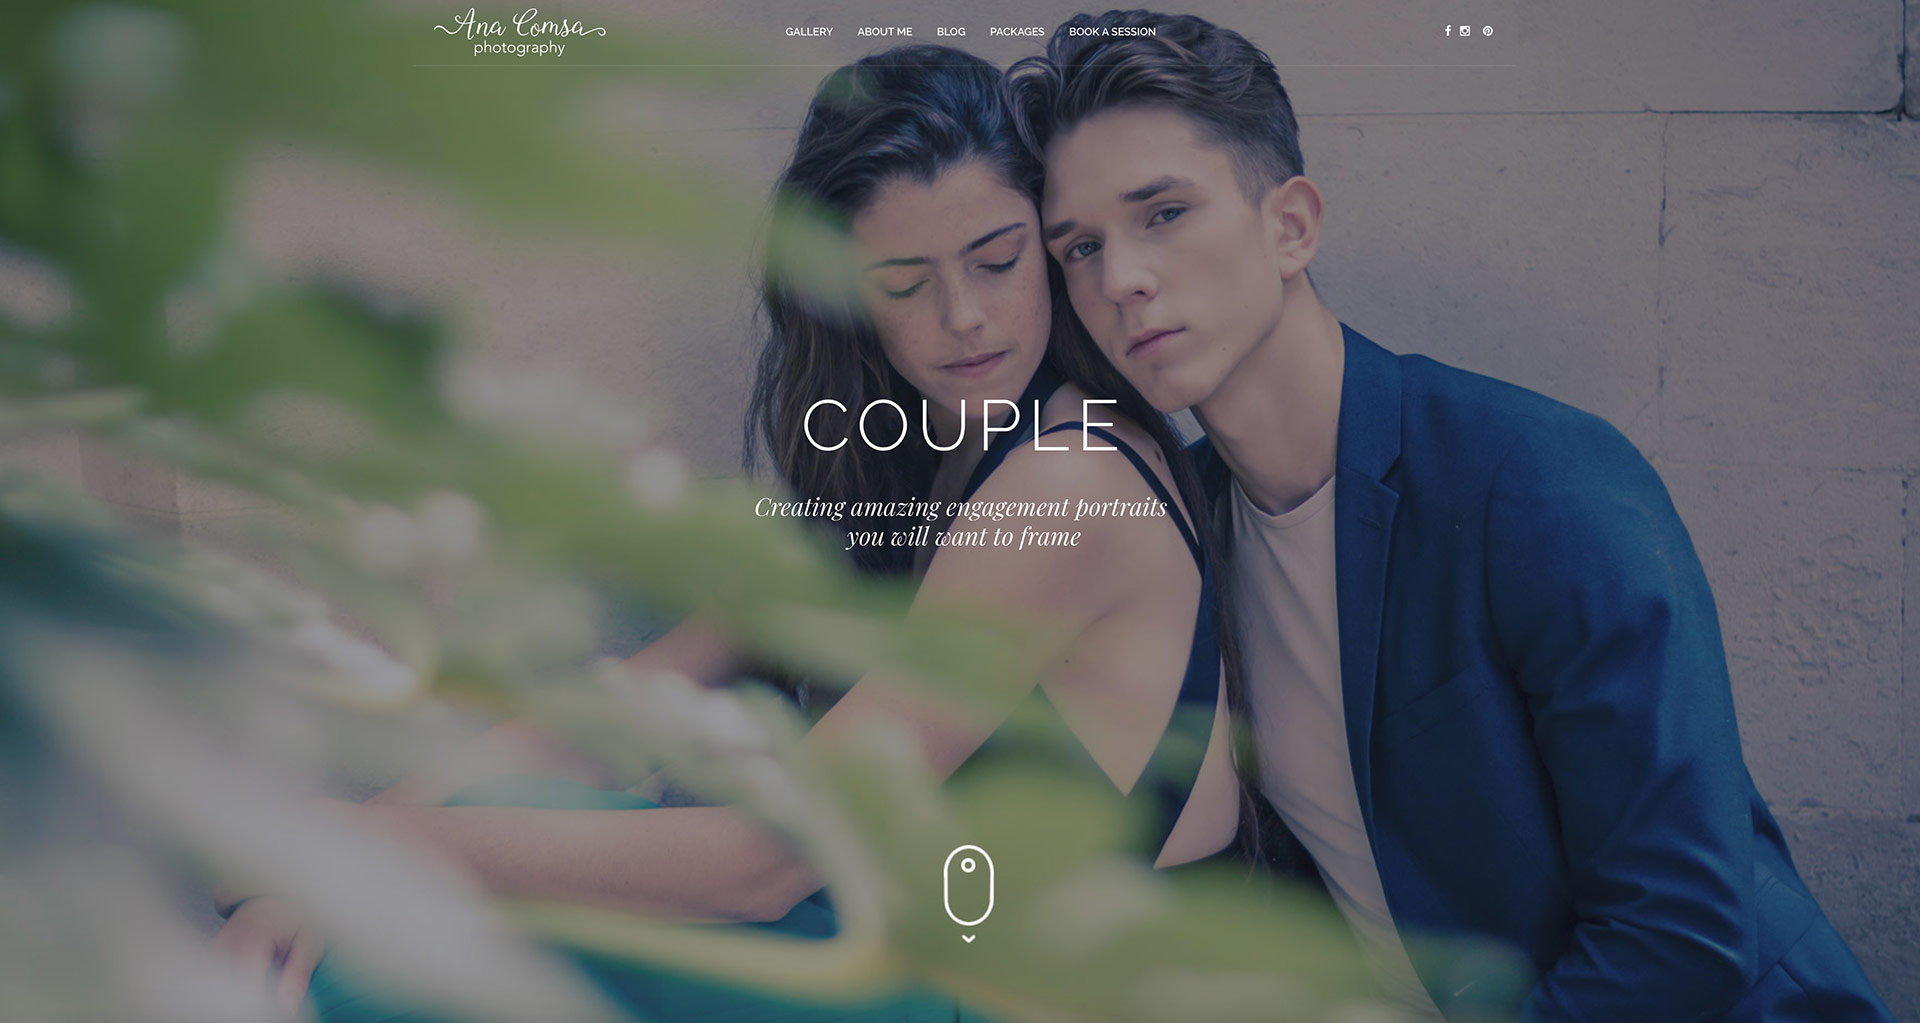 Website_AnaComsa3